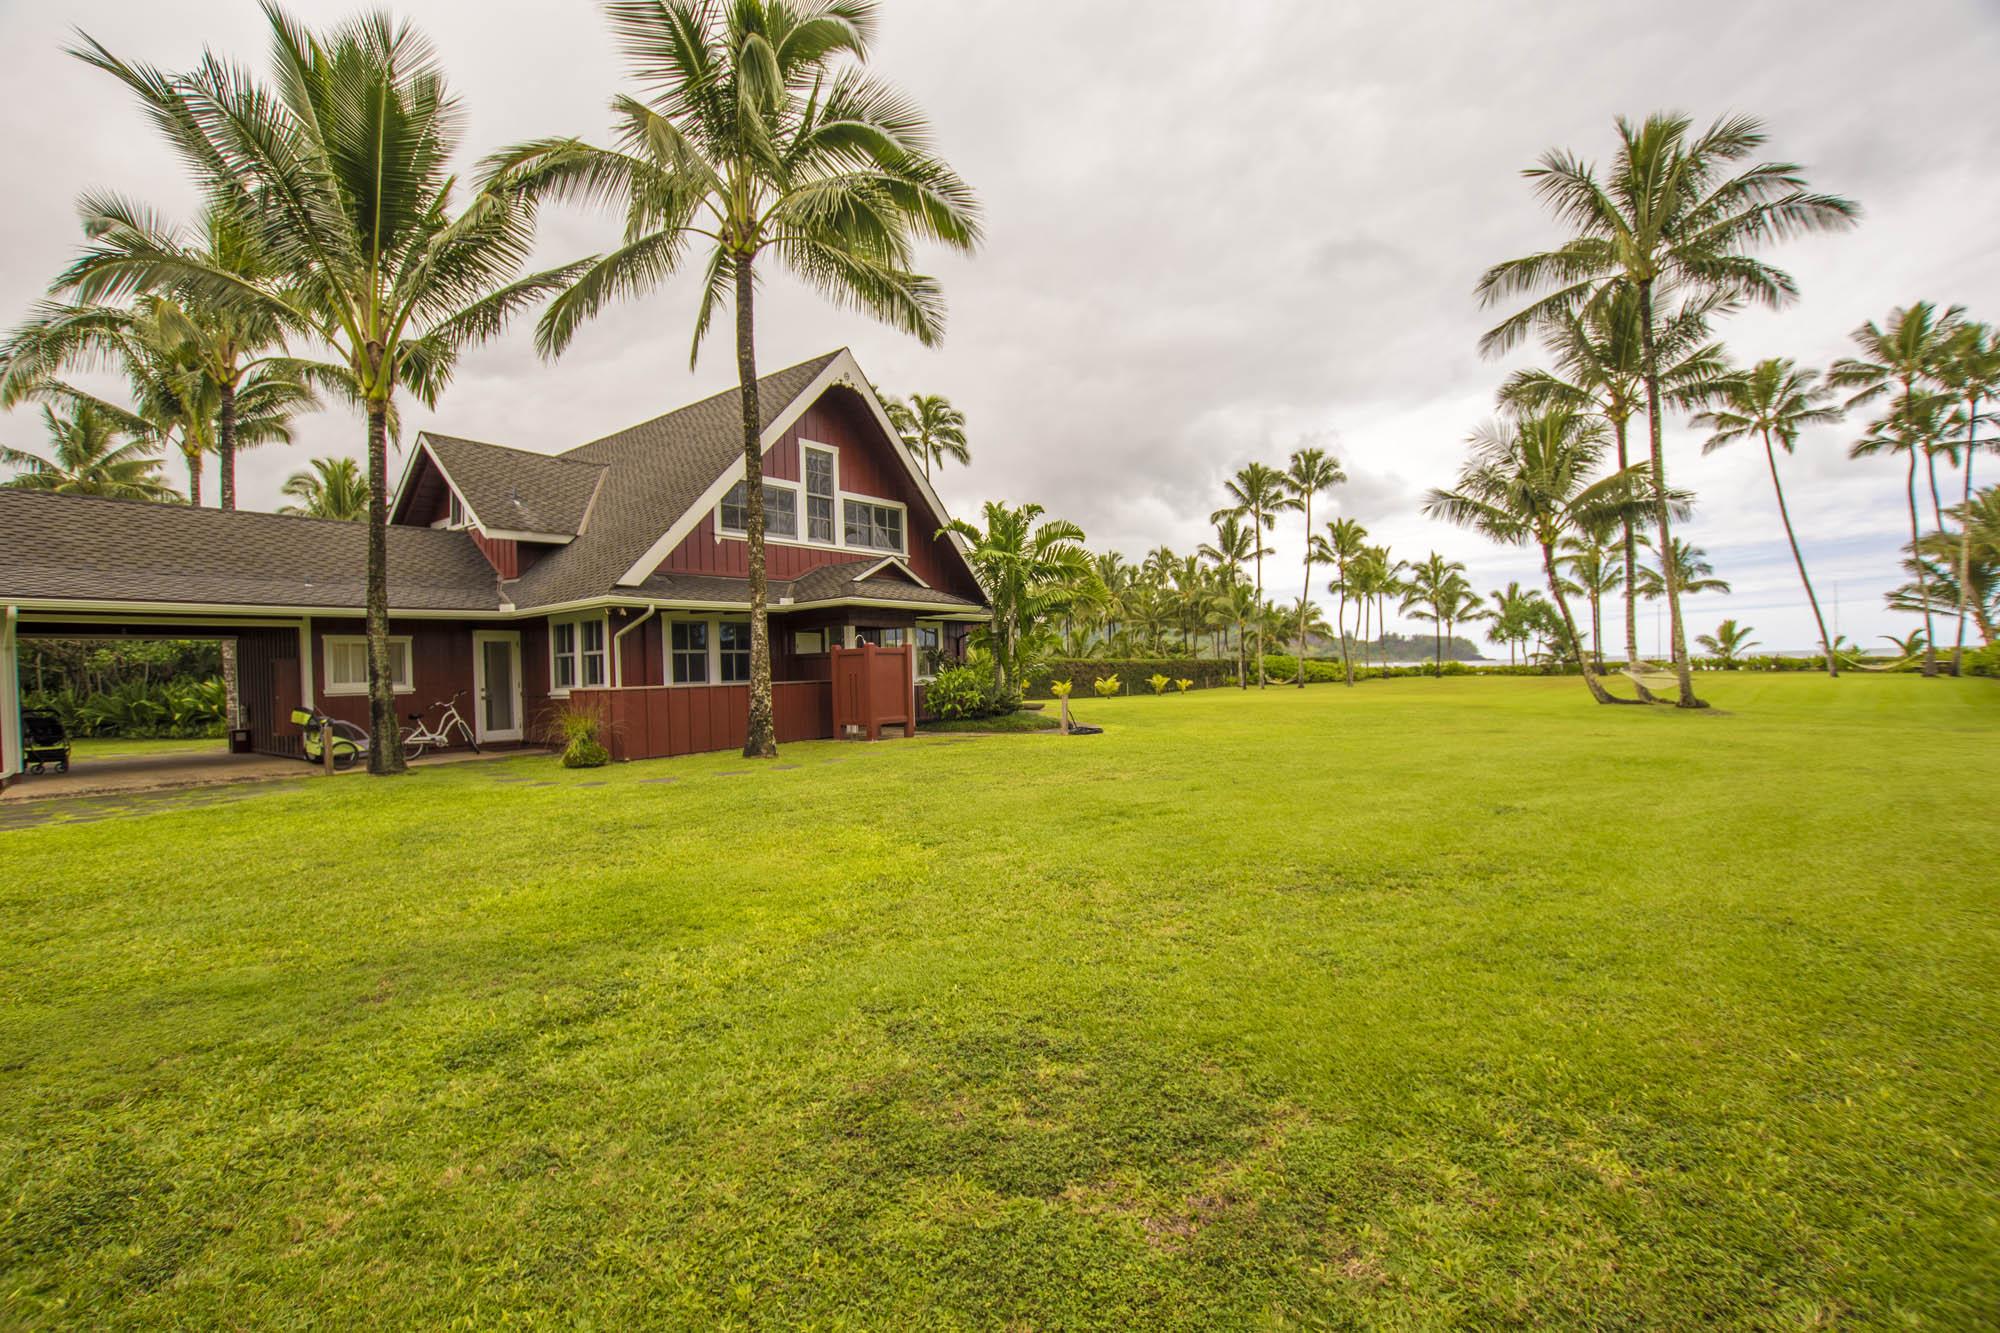 Kauai-217-Hanalei Bay6